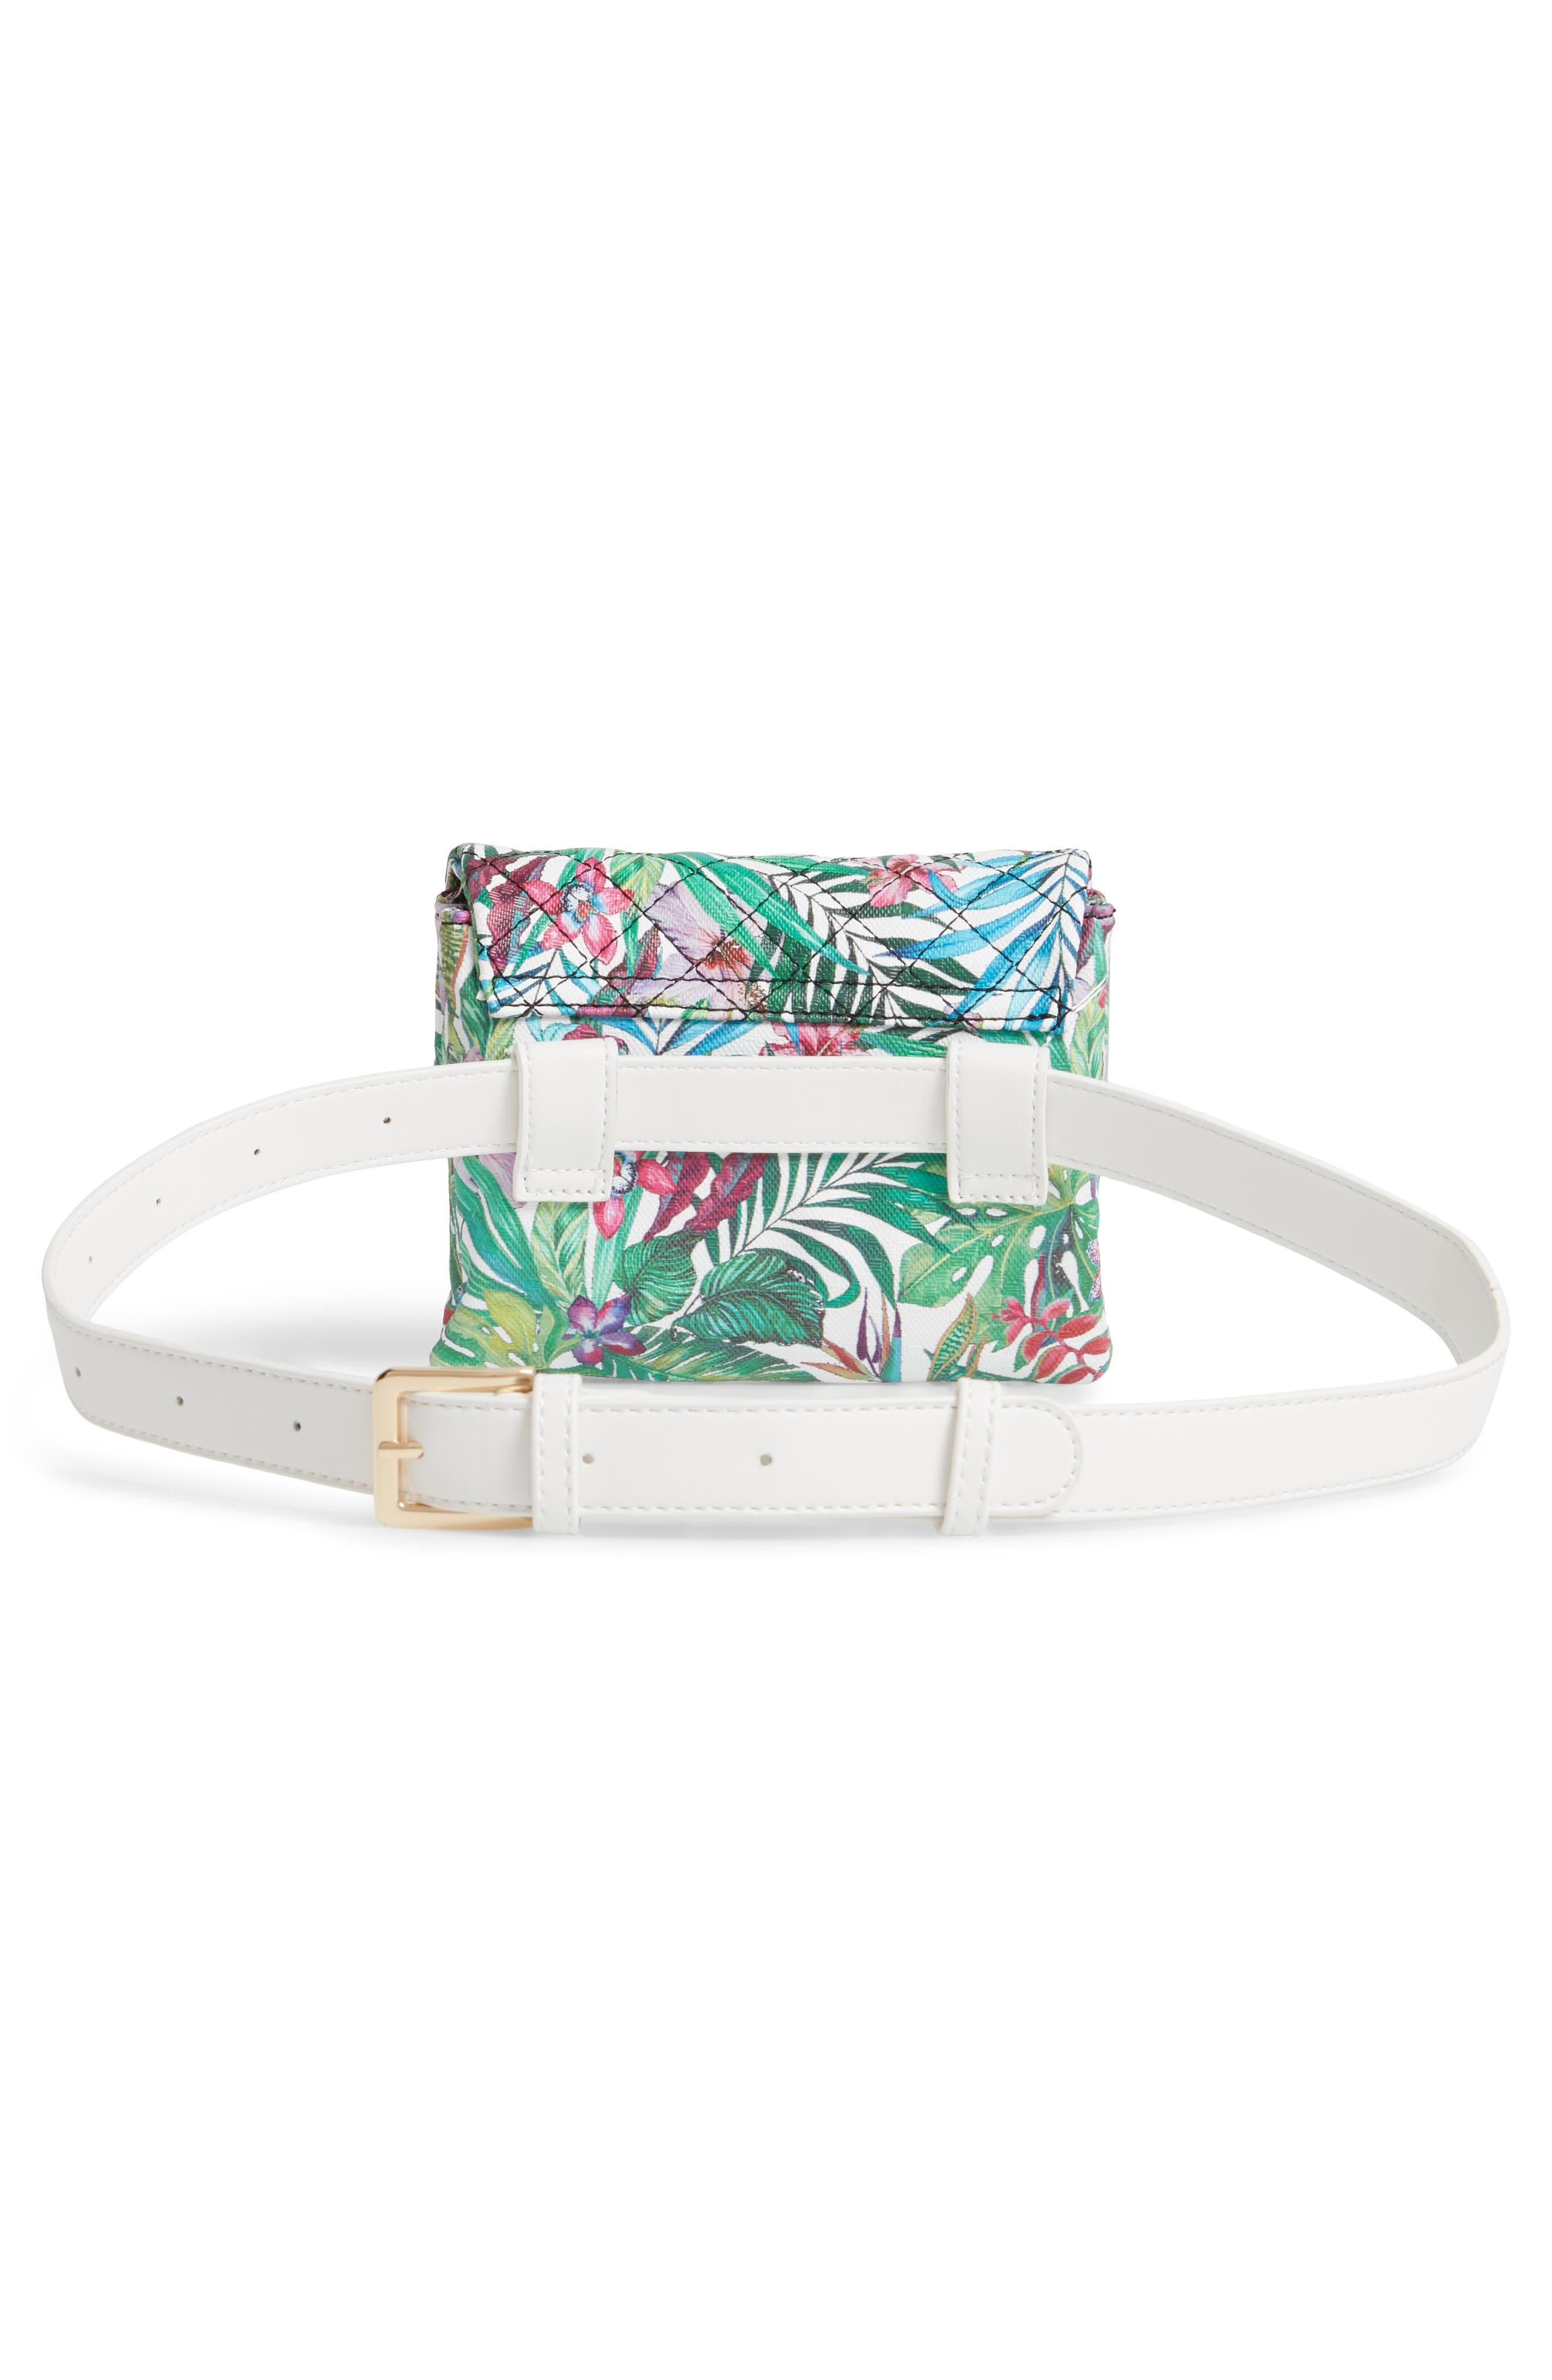 MALI + LILI,                             Quilted Vegan Leather Belt Bag,                             Alternate thumbnail 5, color,                             WHITE FLORAL